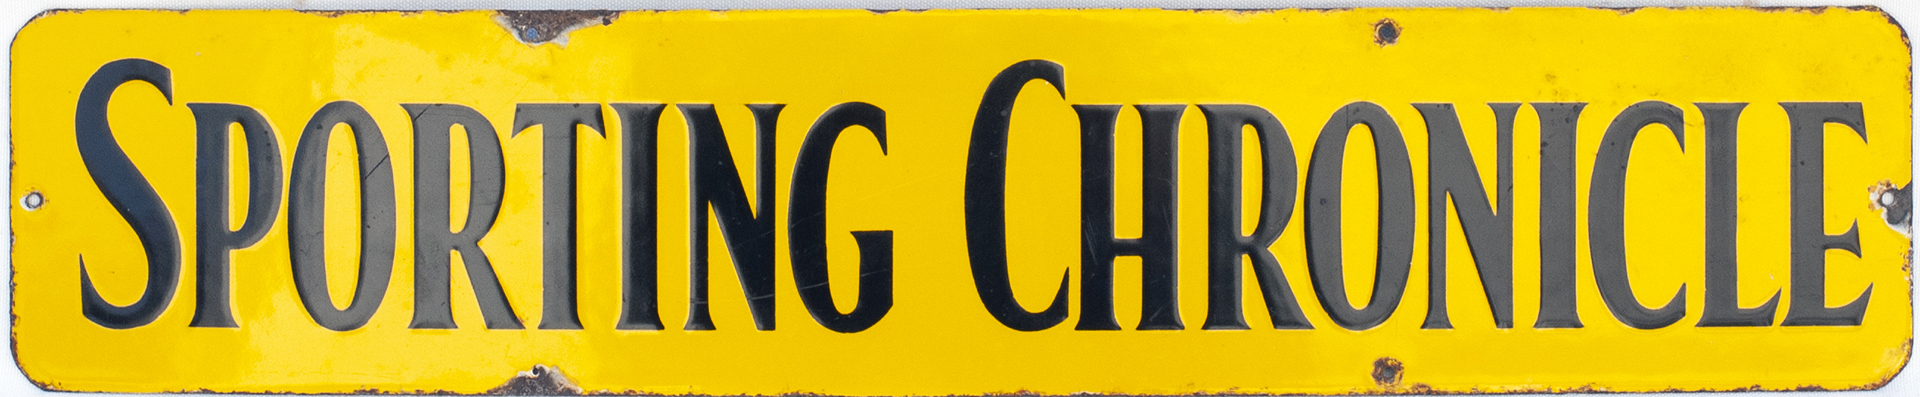 Advertising Enamel Sign SPORTING CHRONICLE. In